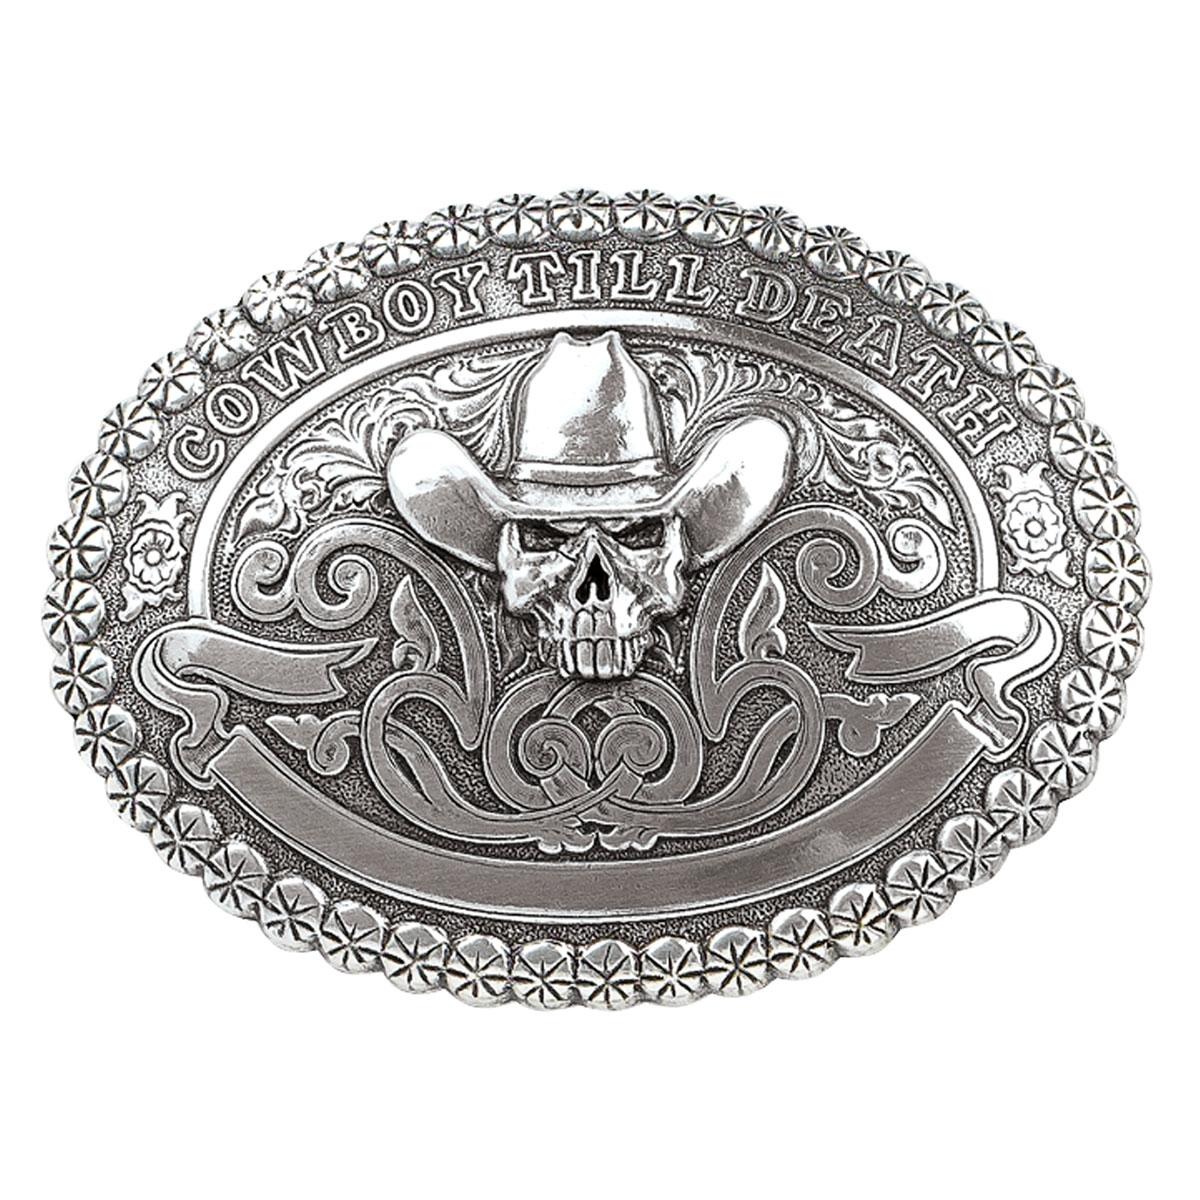 Crumrine Cowboy Till Death - Belt Buckle